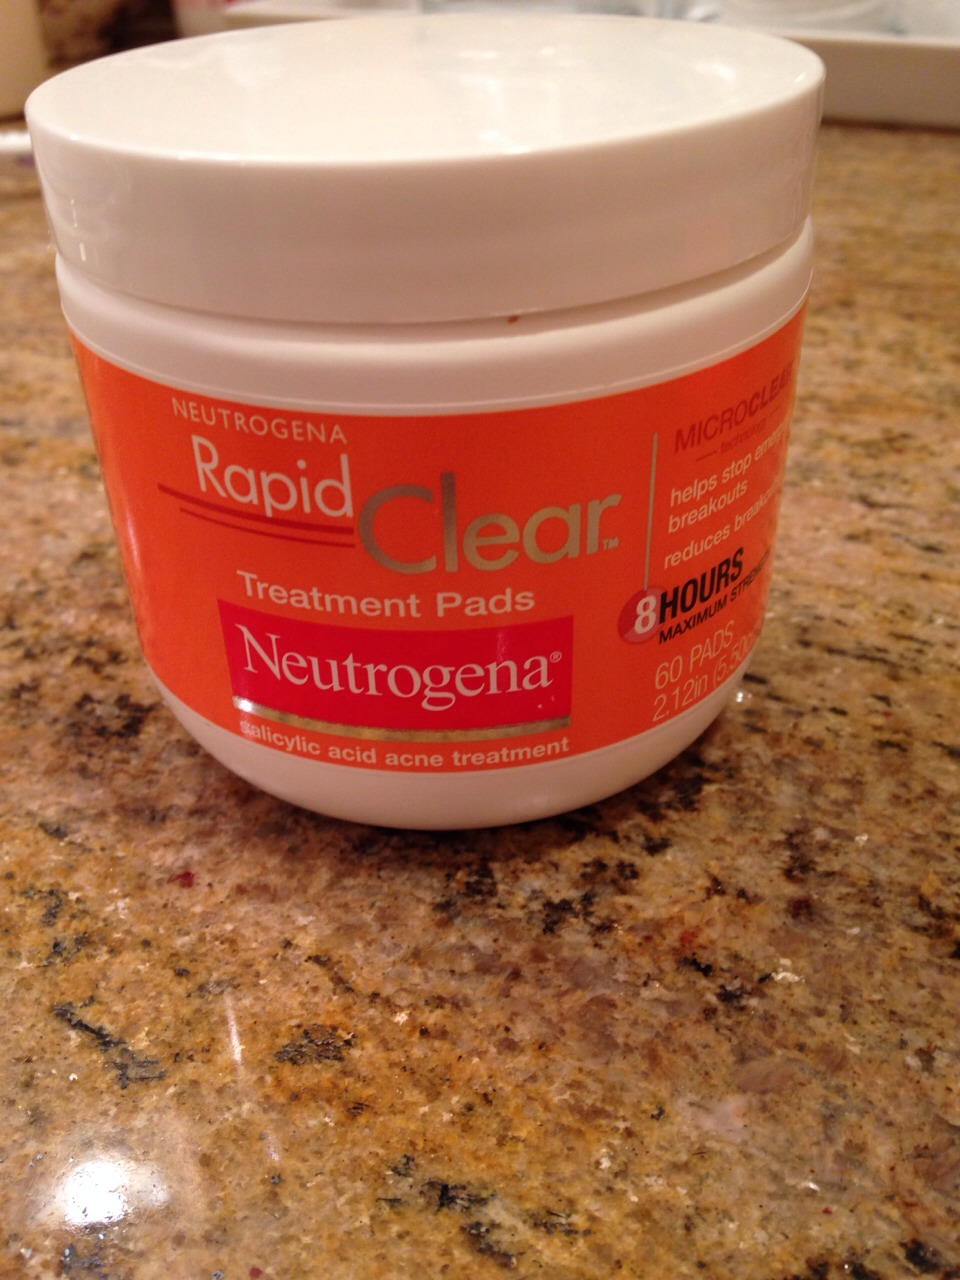 1st buy Neutrogena rapid clear treatment pads.